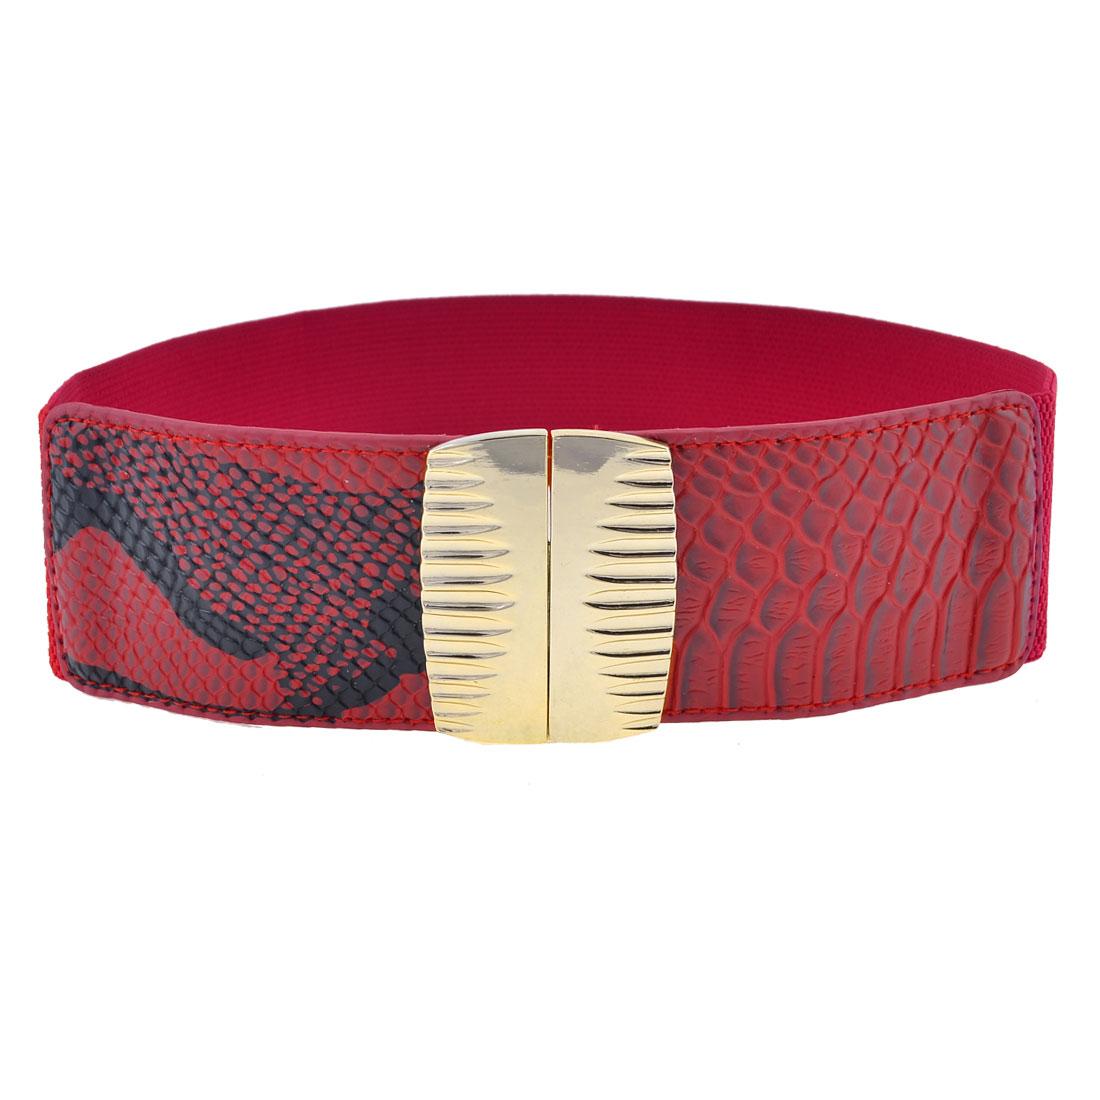 Rectangle Shape Metal Interlocking Buckle Elastic Cinch Belt Band Red for Women